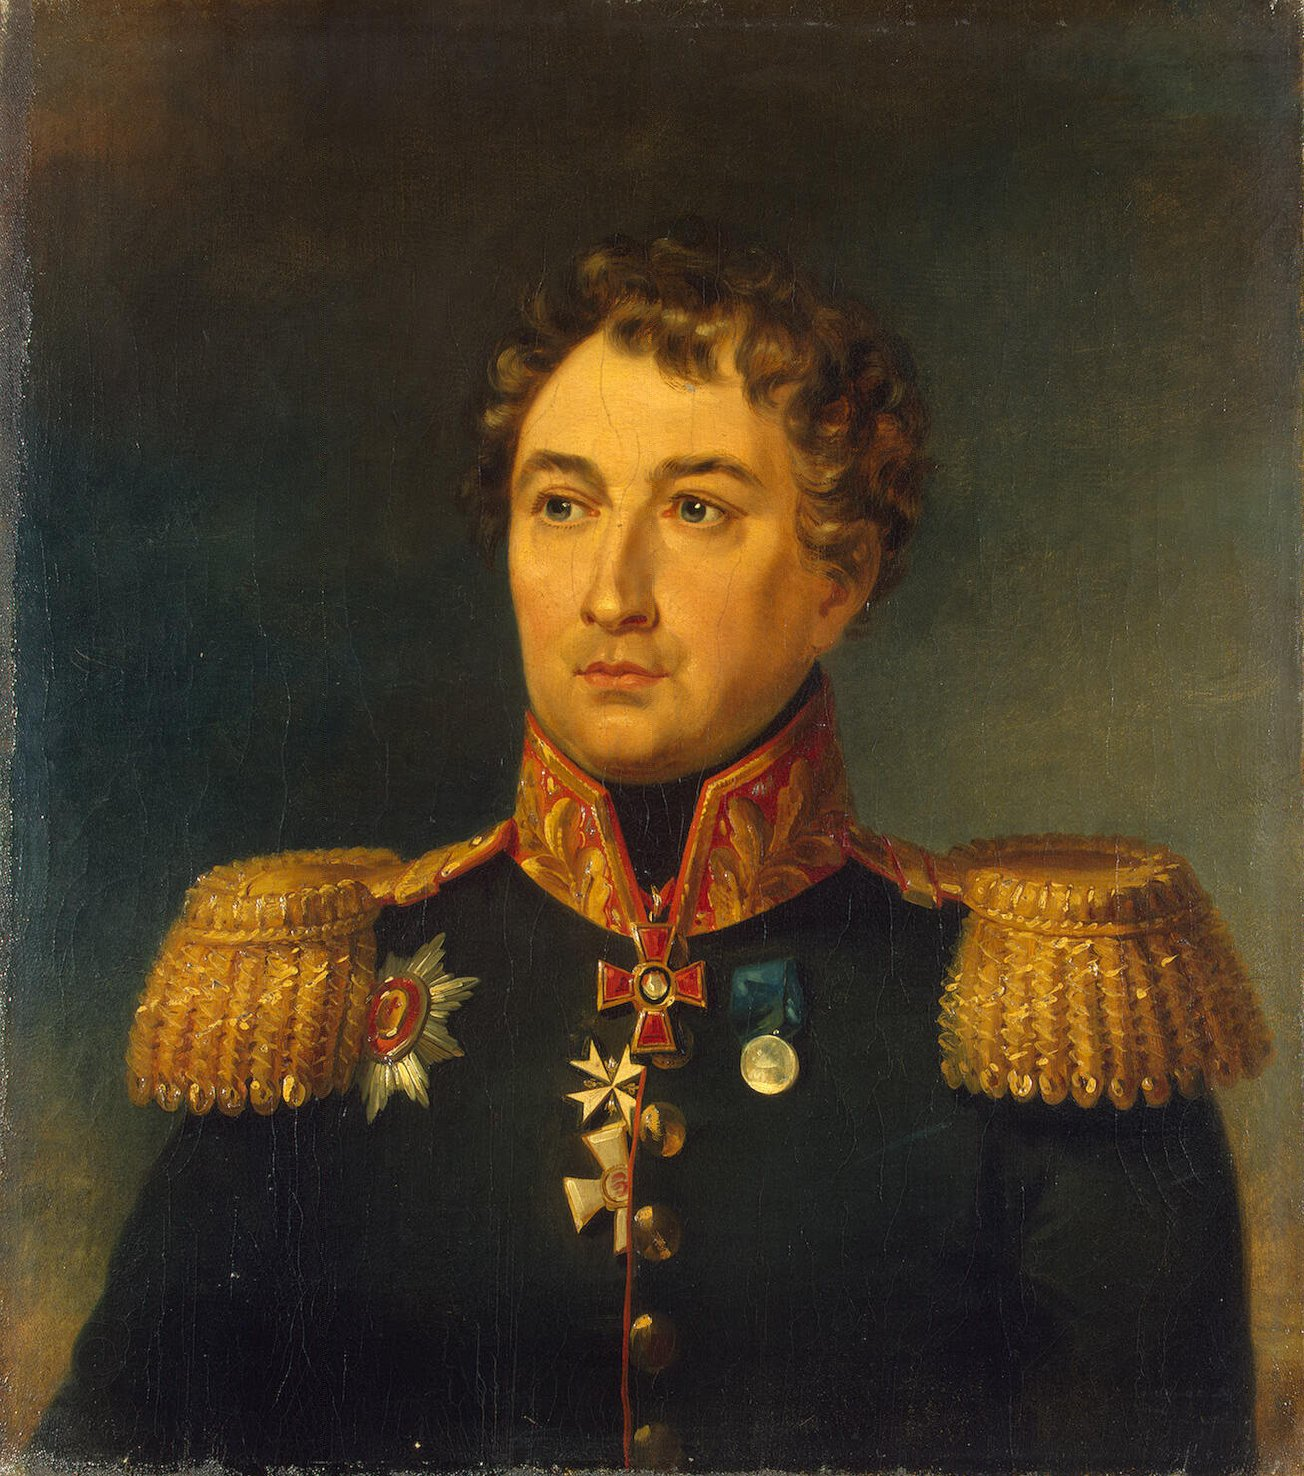 Колюбакин, Пётр Михайлович